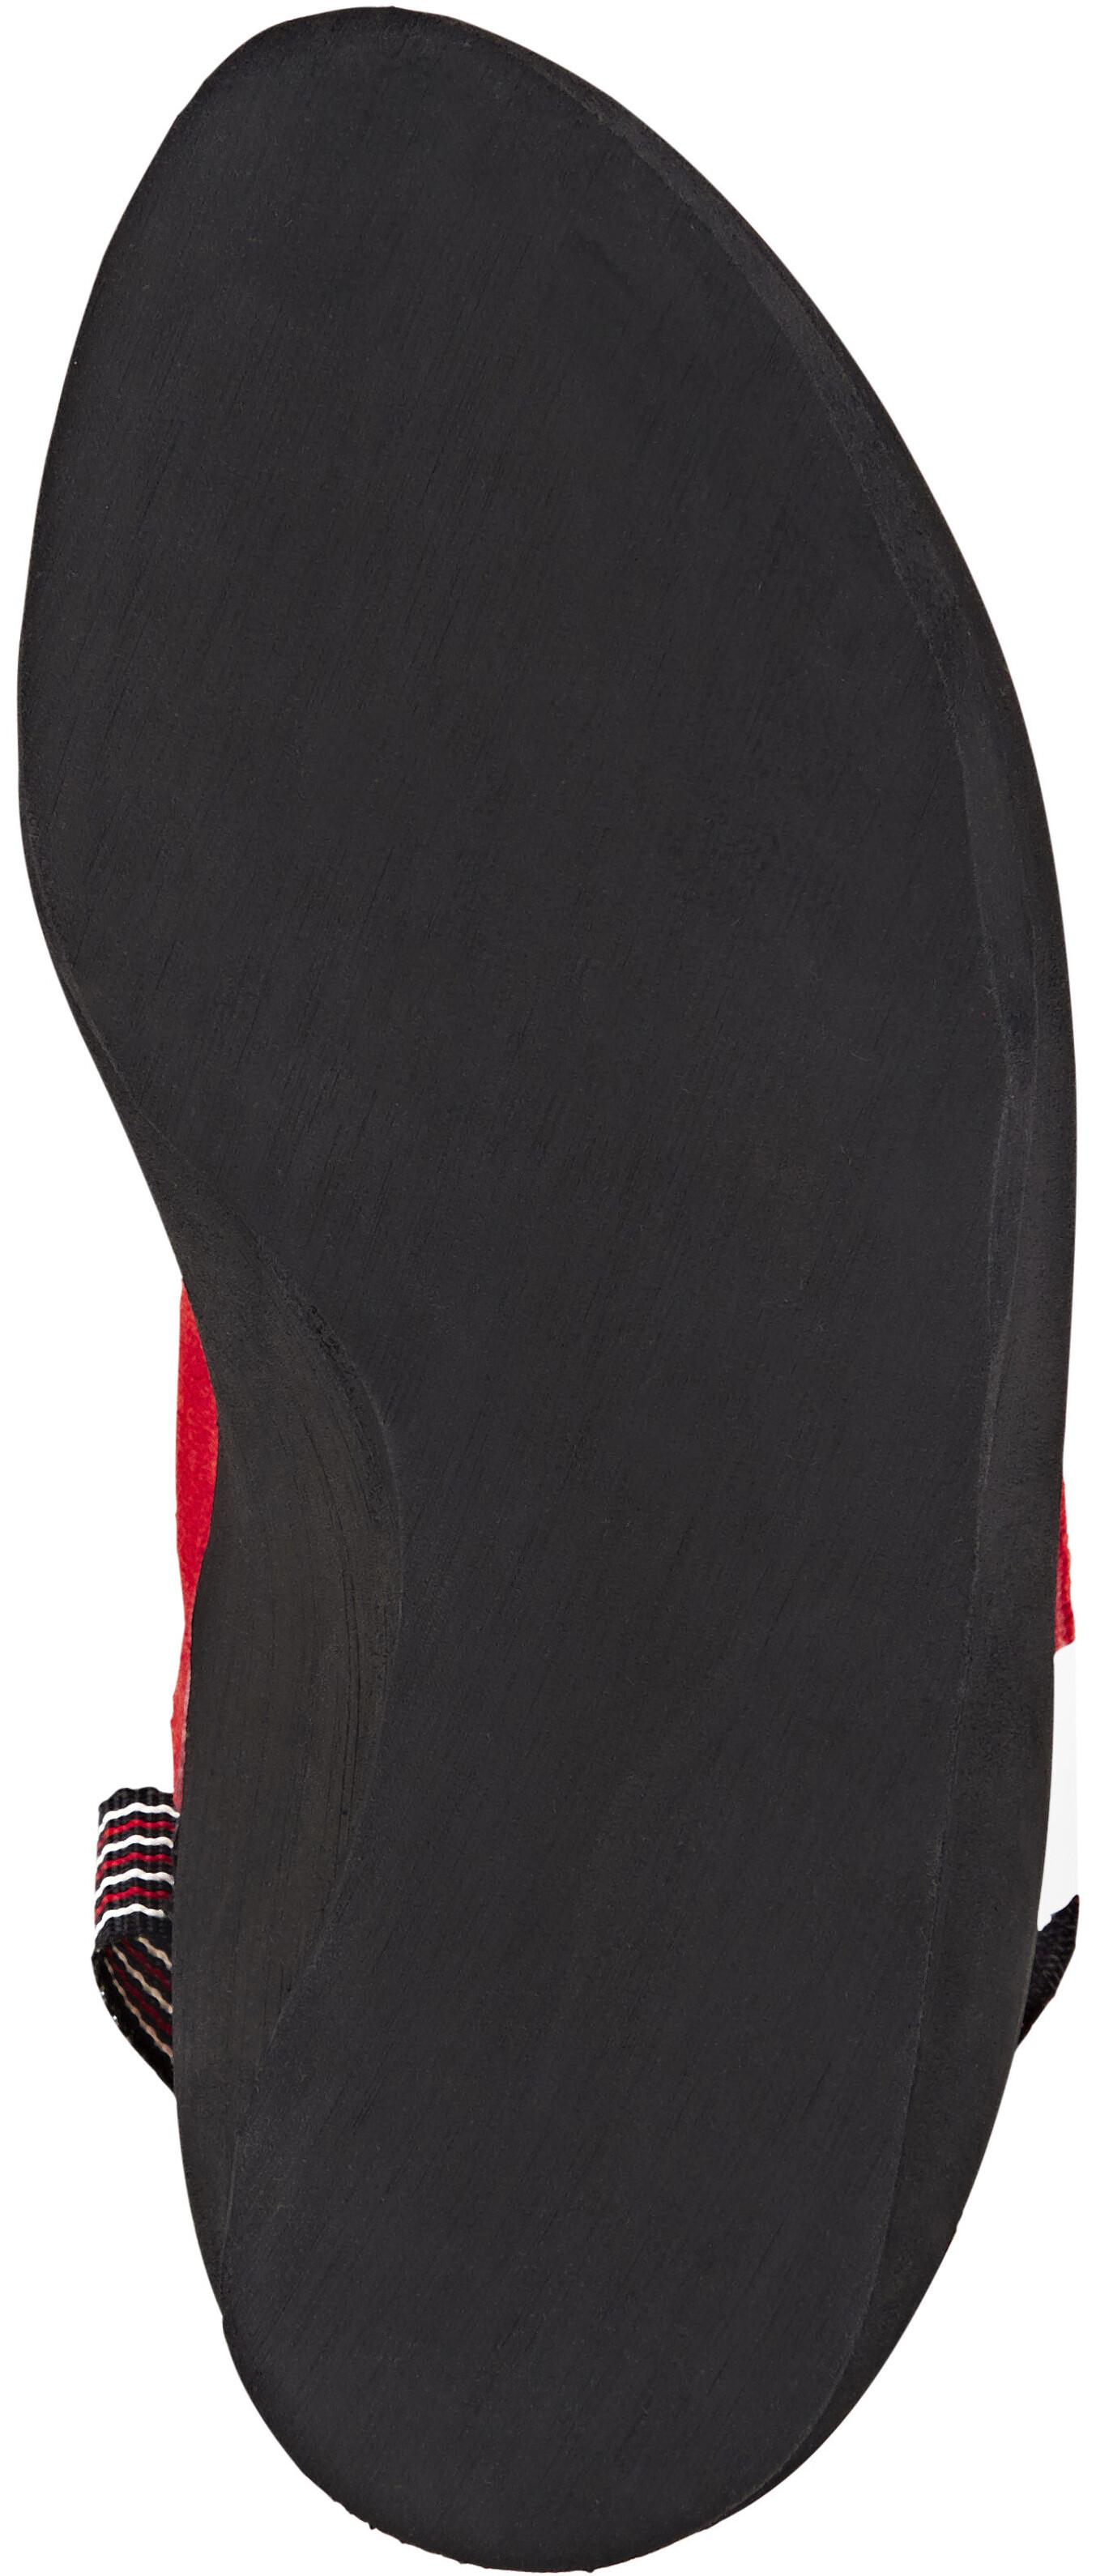 a04f9f7917da2 Boreal Ninja Junior - Chaussures d escalade Enfant - rouge noir sur ...